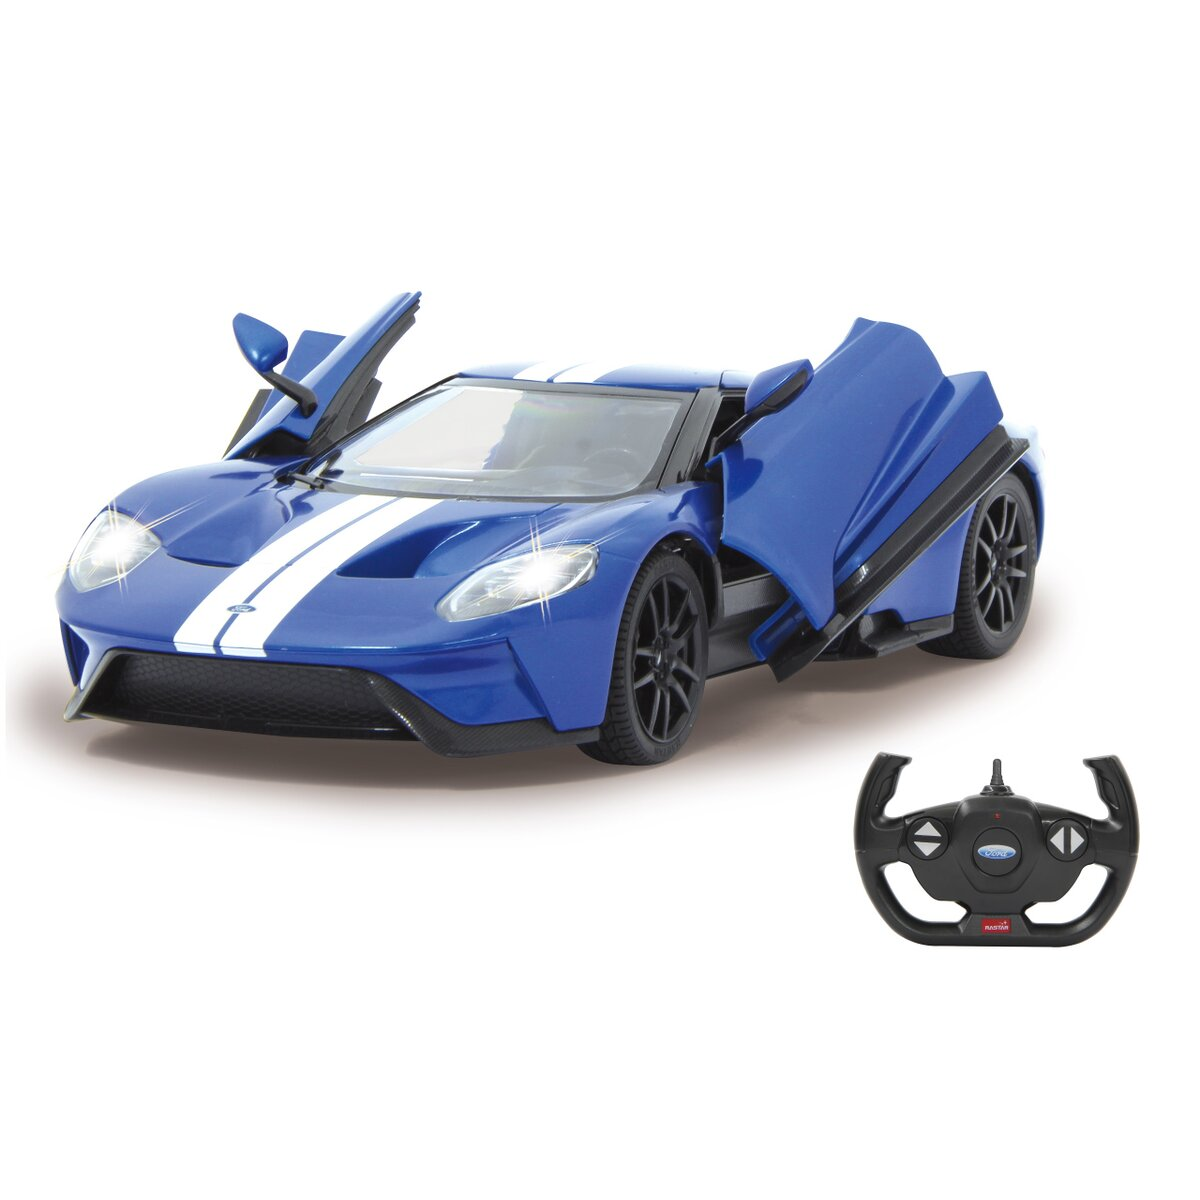 Jamara Ford GT 1:14 modrý s manuálními dveřmi